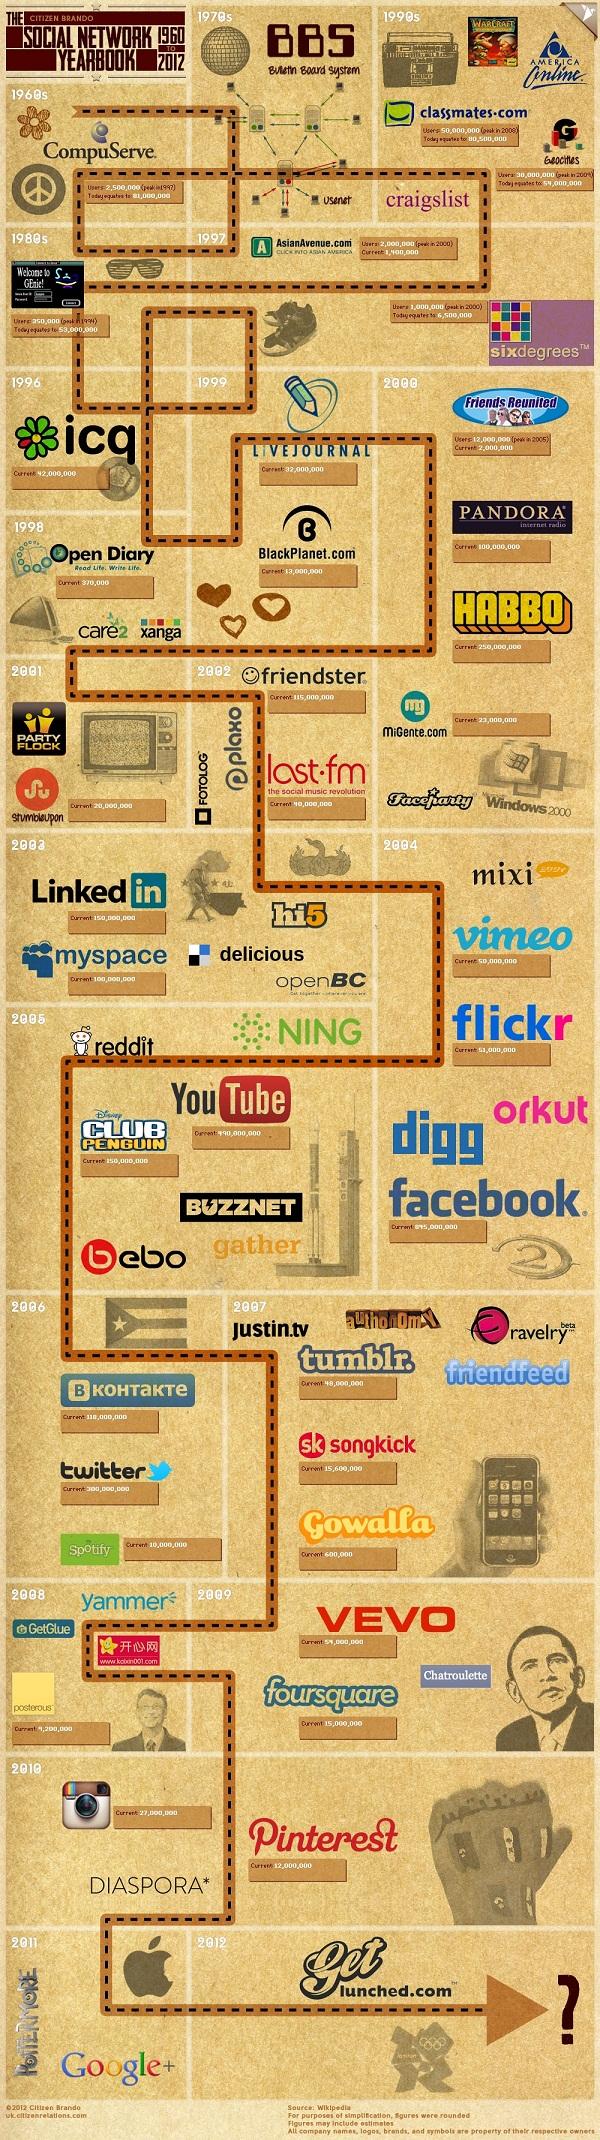 historia-social-media